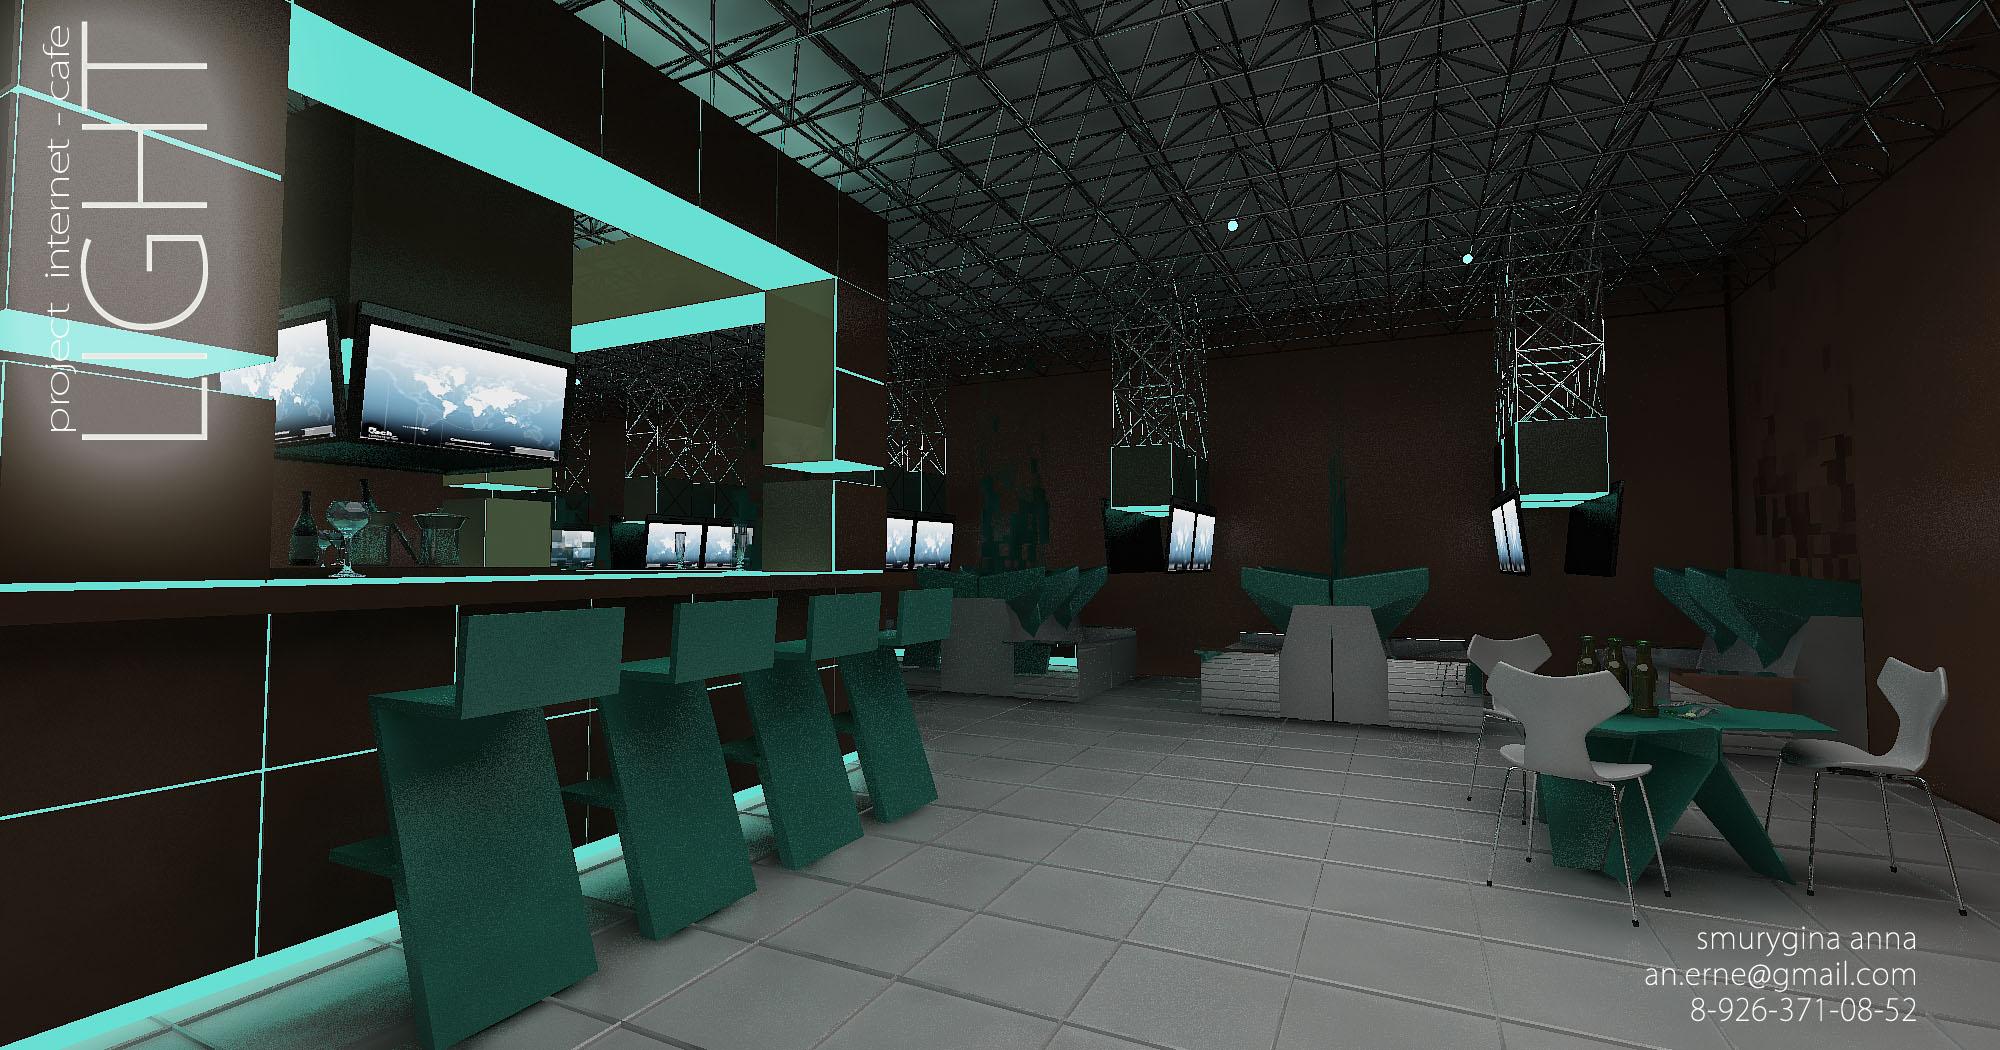 Internet Cafe Interior Design Photo Psoriasisgurucom